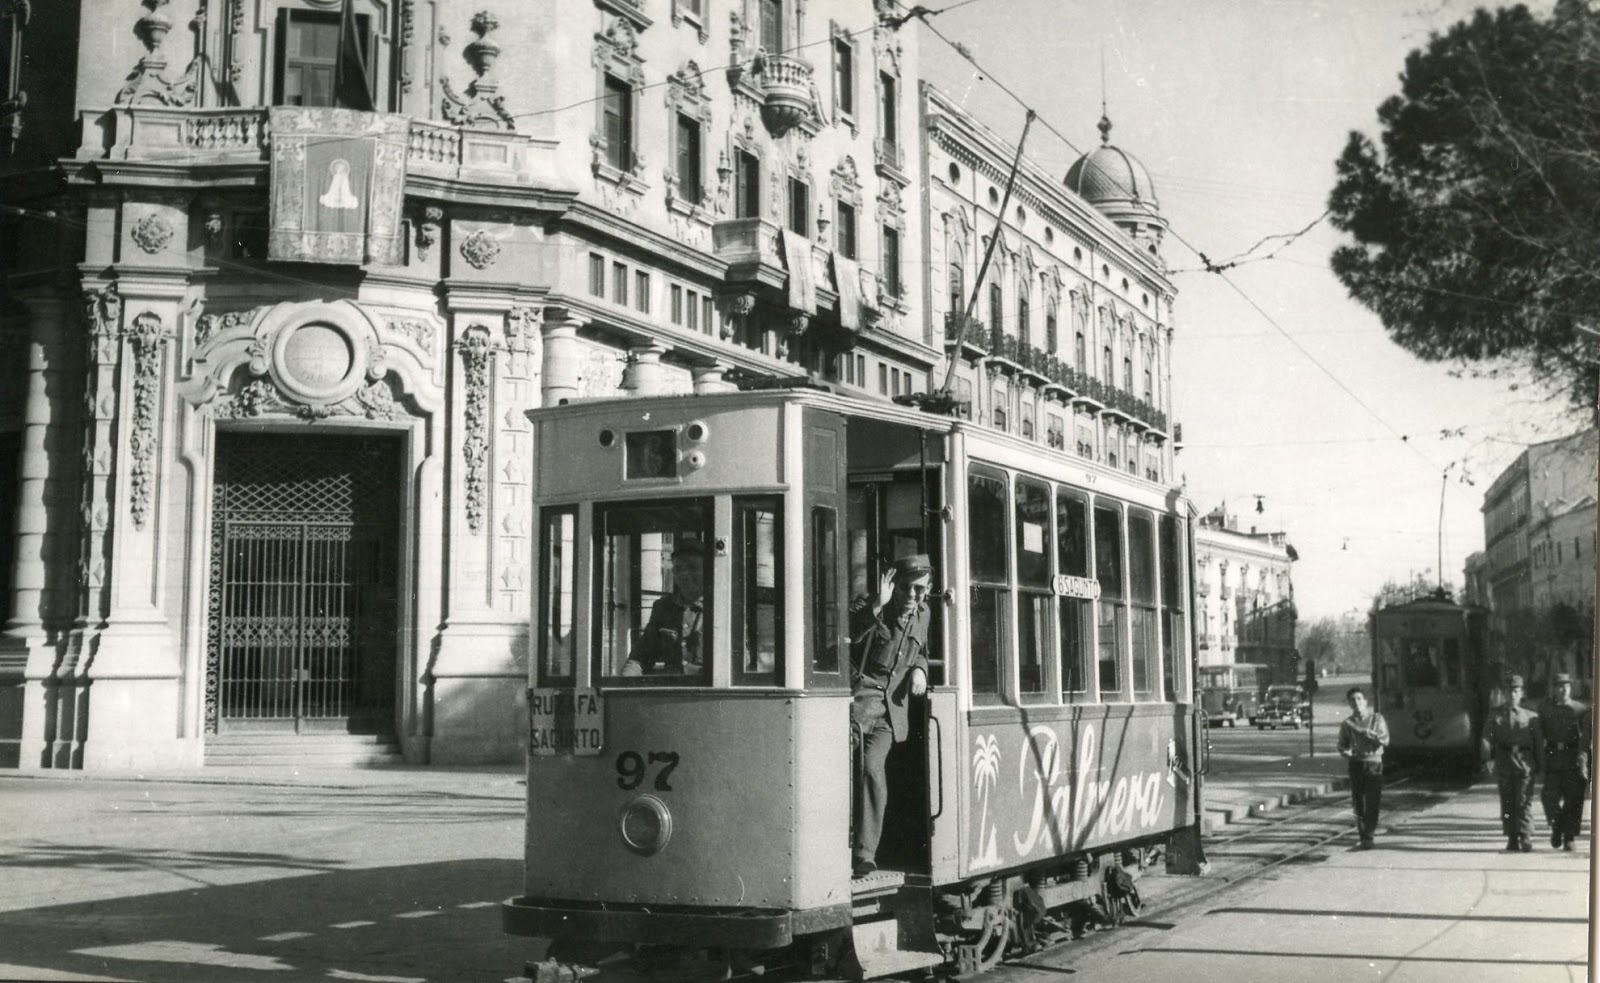 Tranvia nº 97 de Valencia,Ruzafa a Sagunto, serie 85 a 150 año 1954, fografia G.Masino